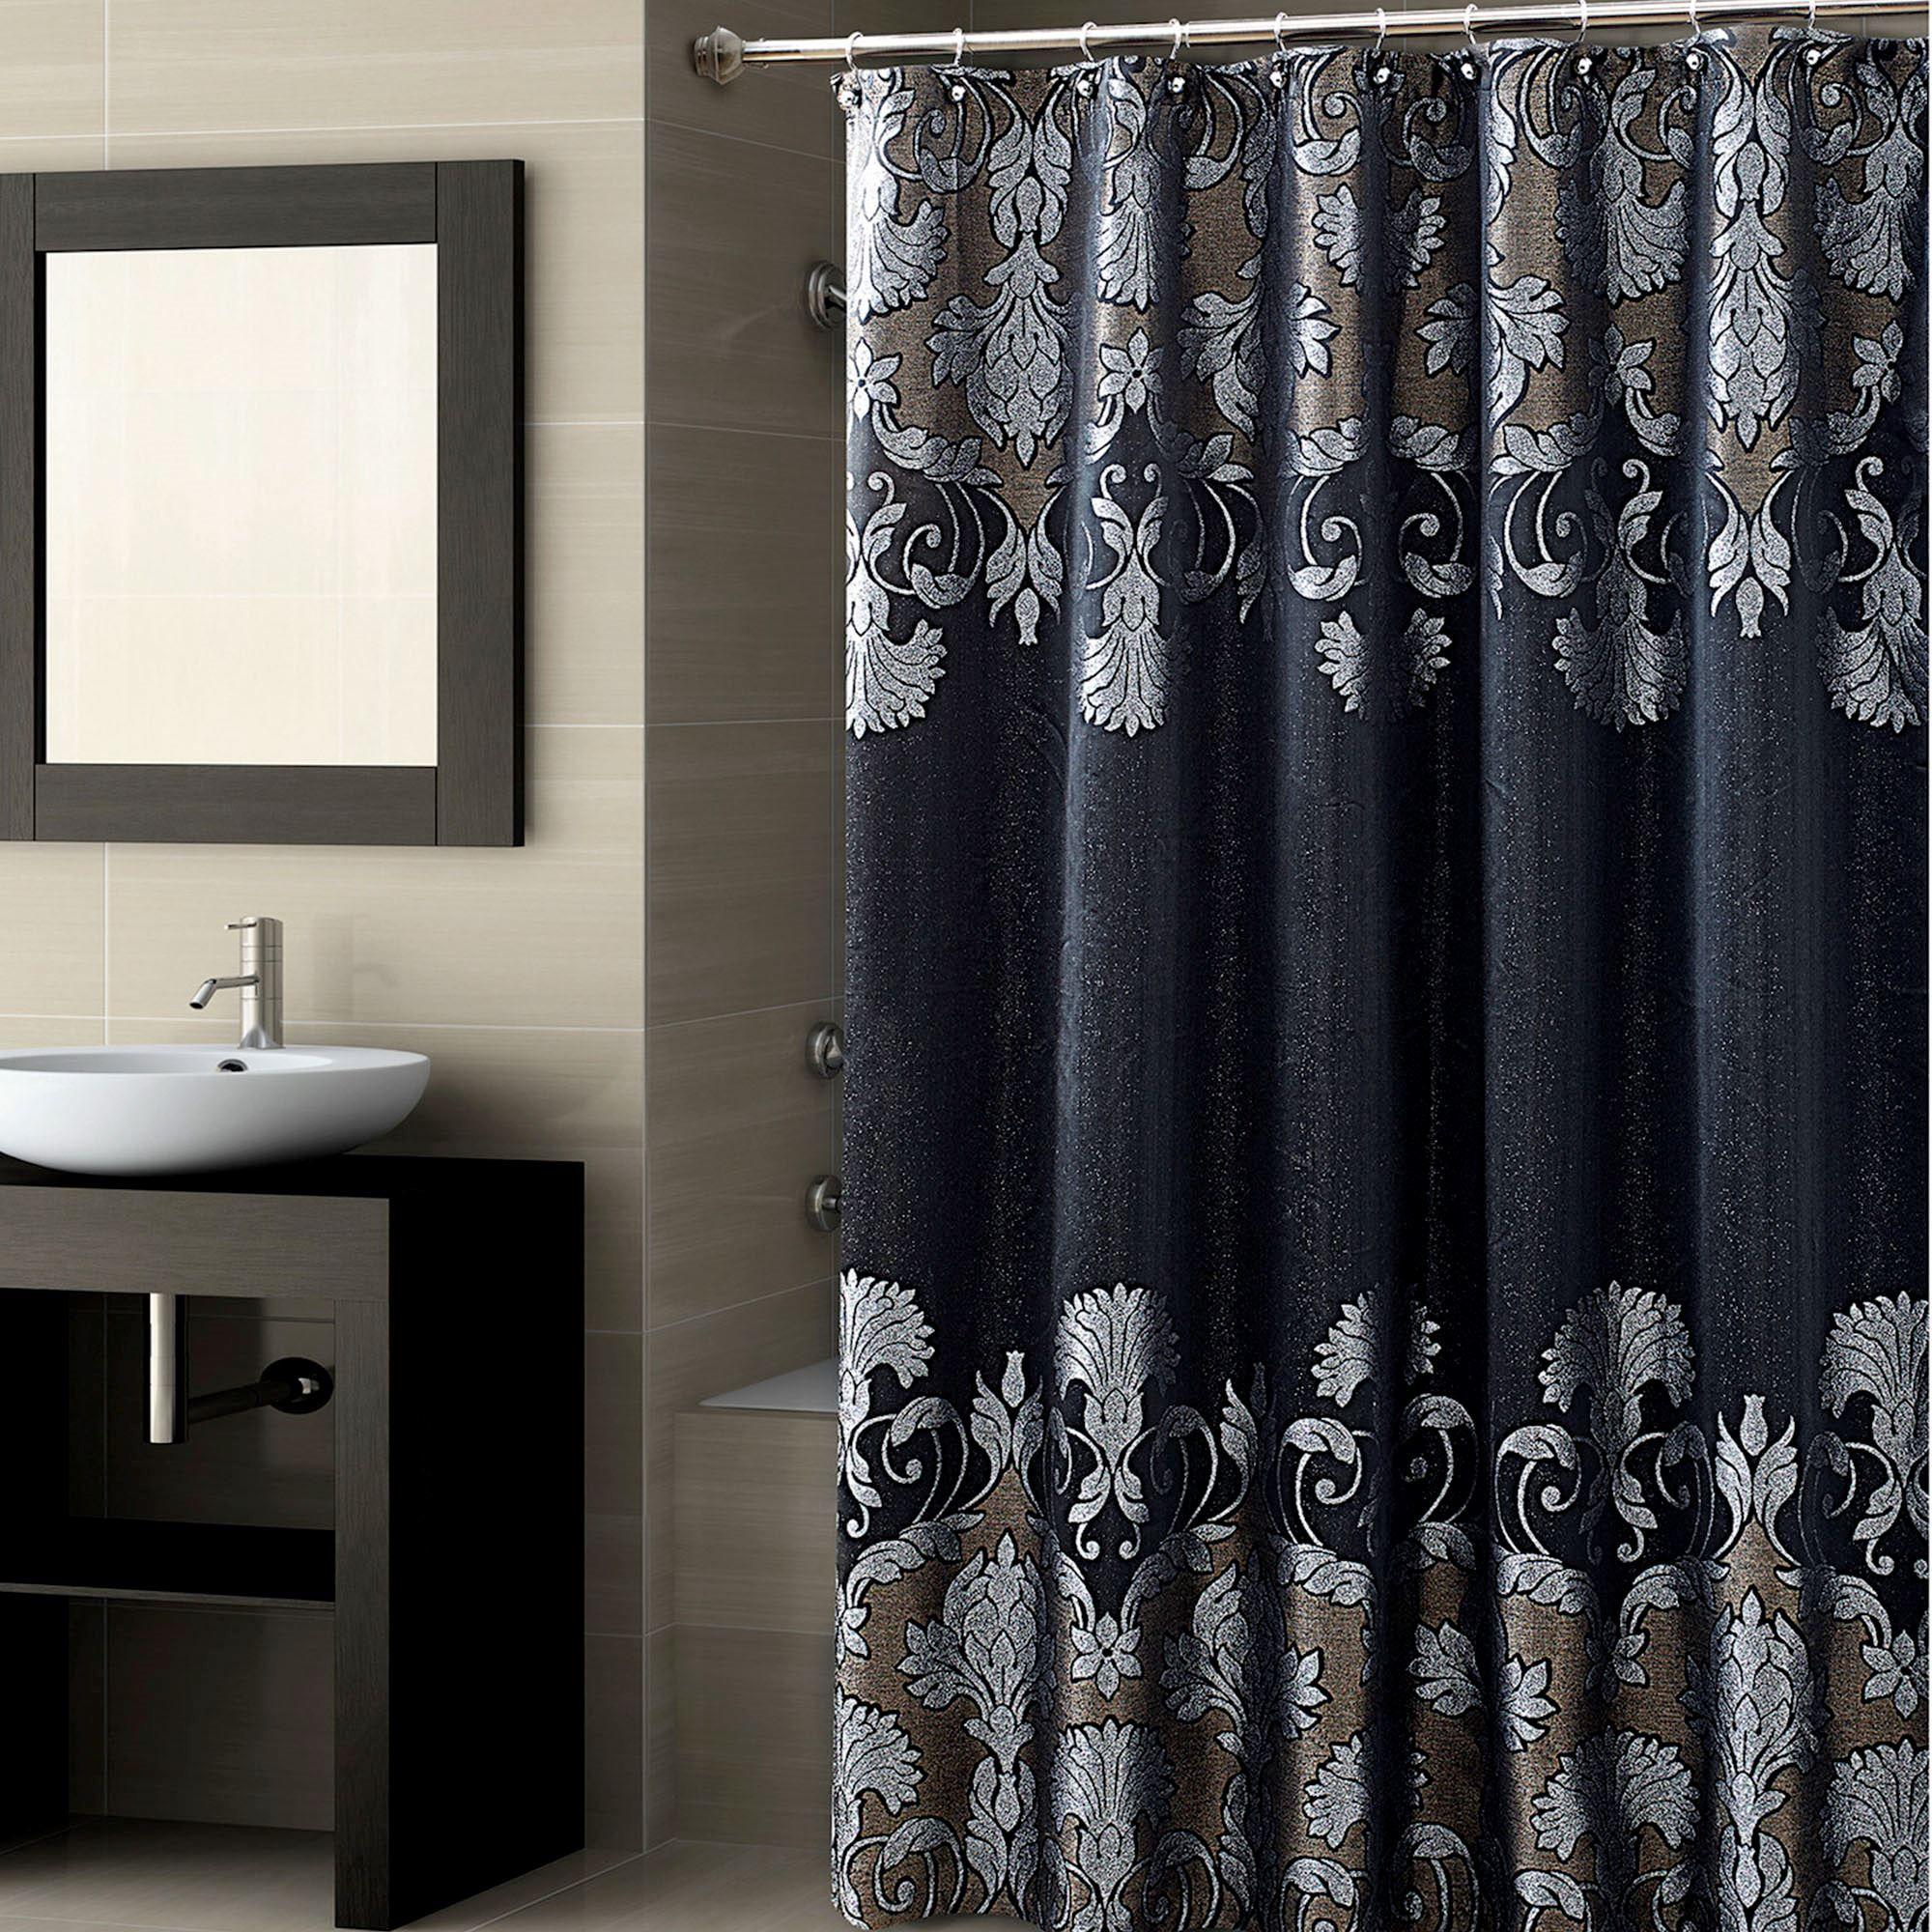 Castella Shower Curtain Black 72 X 72 Shower Curtain Decor Black Shower Curtains Fabric Shower Curtains